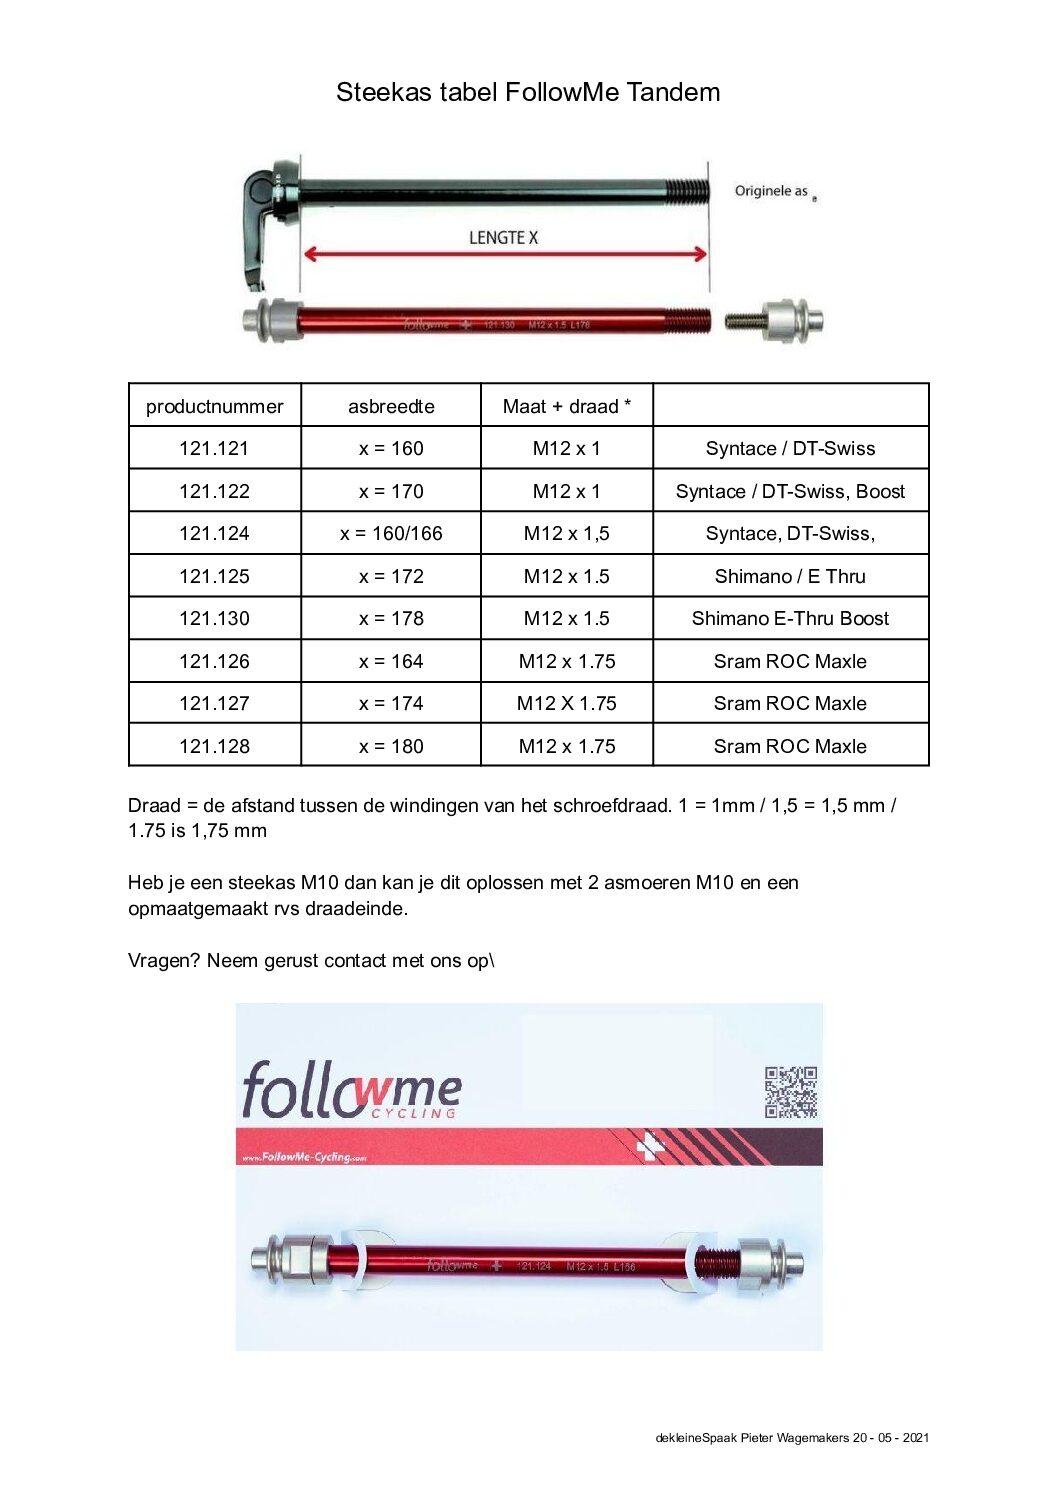 Steekas tabel FollowMe Tandem 2 pdf